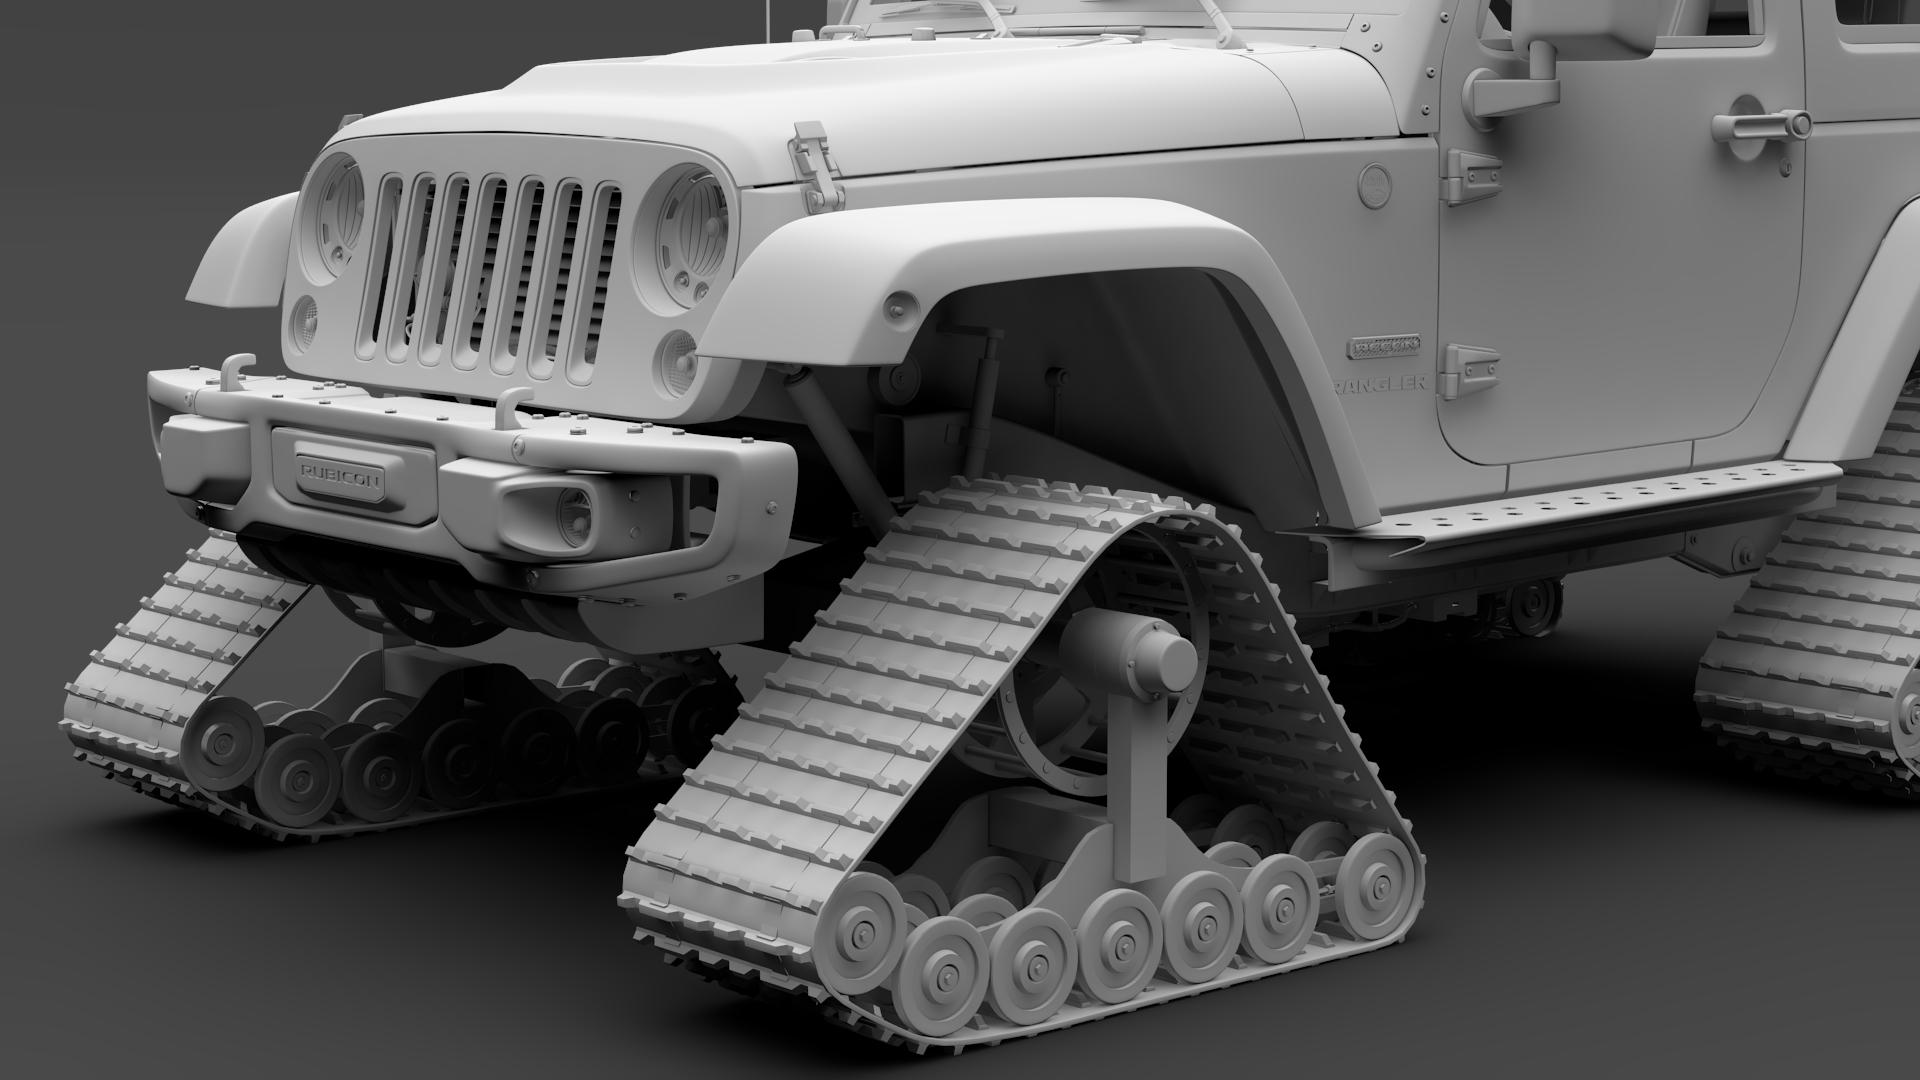 jeep wrangler crawler rubicon recon jk 2017 3d model max fbx c4d lwo ma mb hrc xsi obj 276925